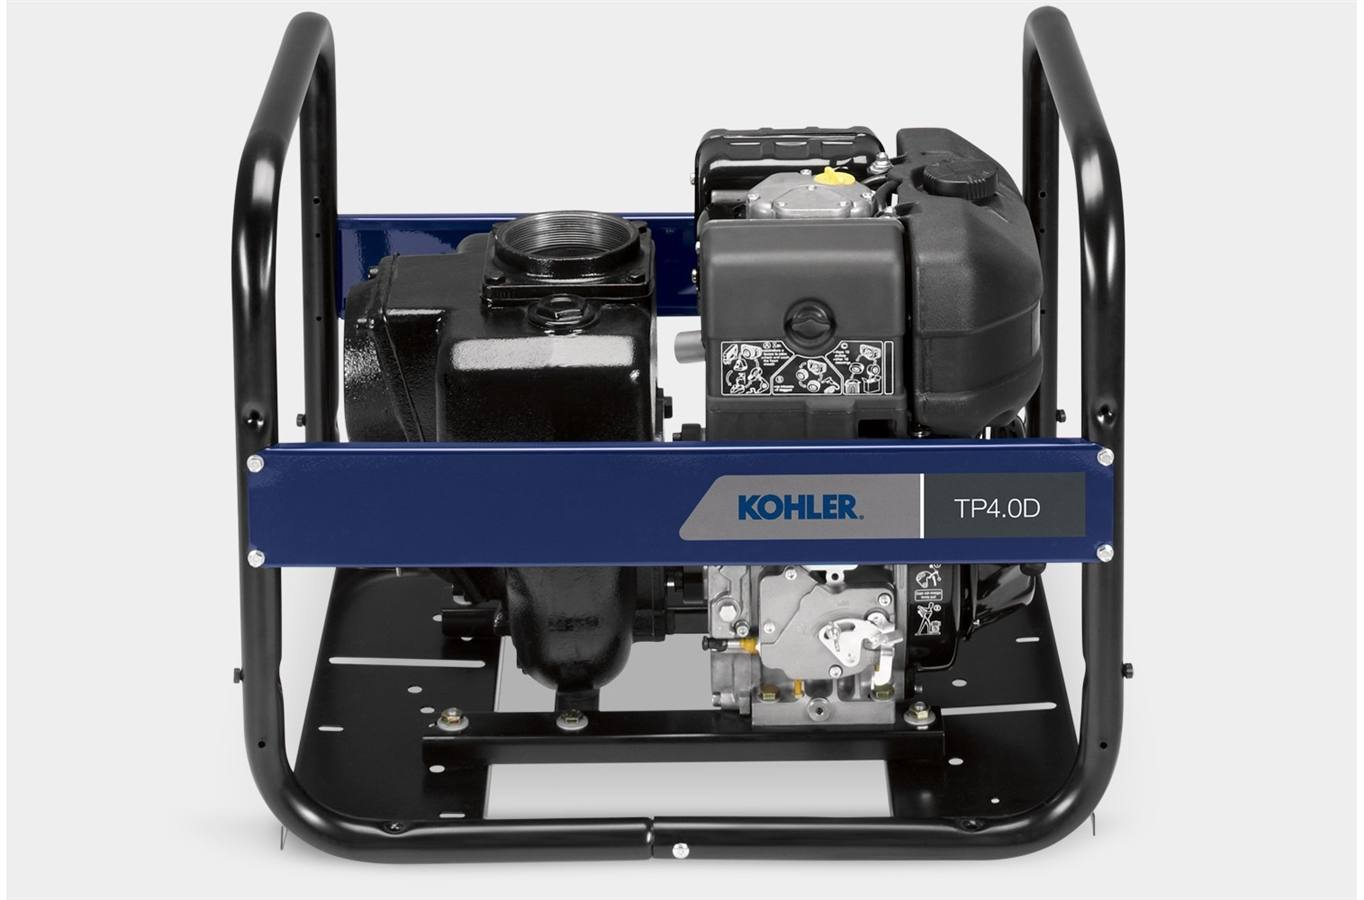 2018 Kohler Engine Tp40d For Sale In Kansas City Mo Northland Oil Seal Kit Kc Mio